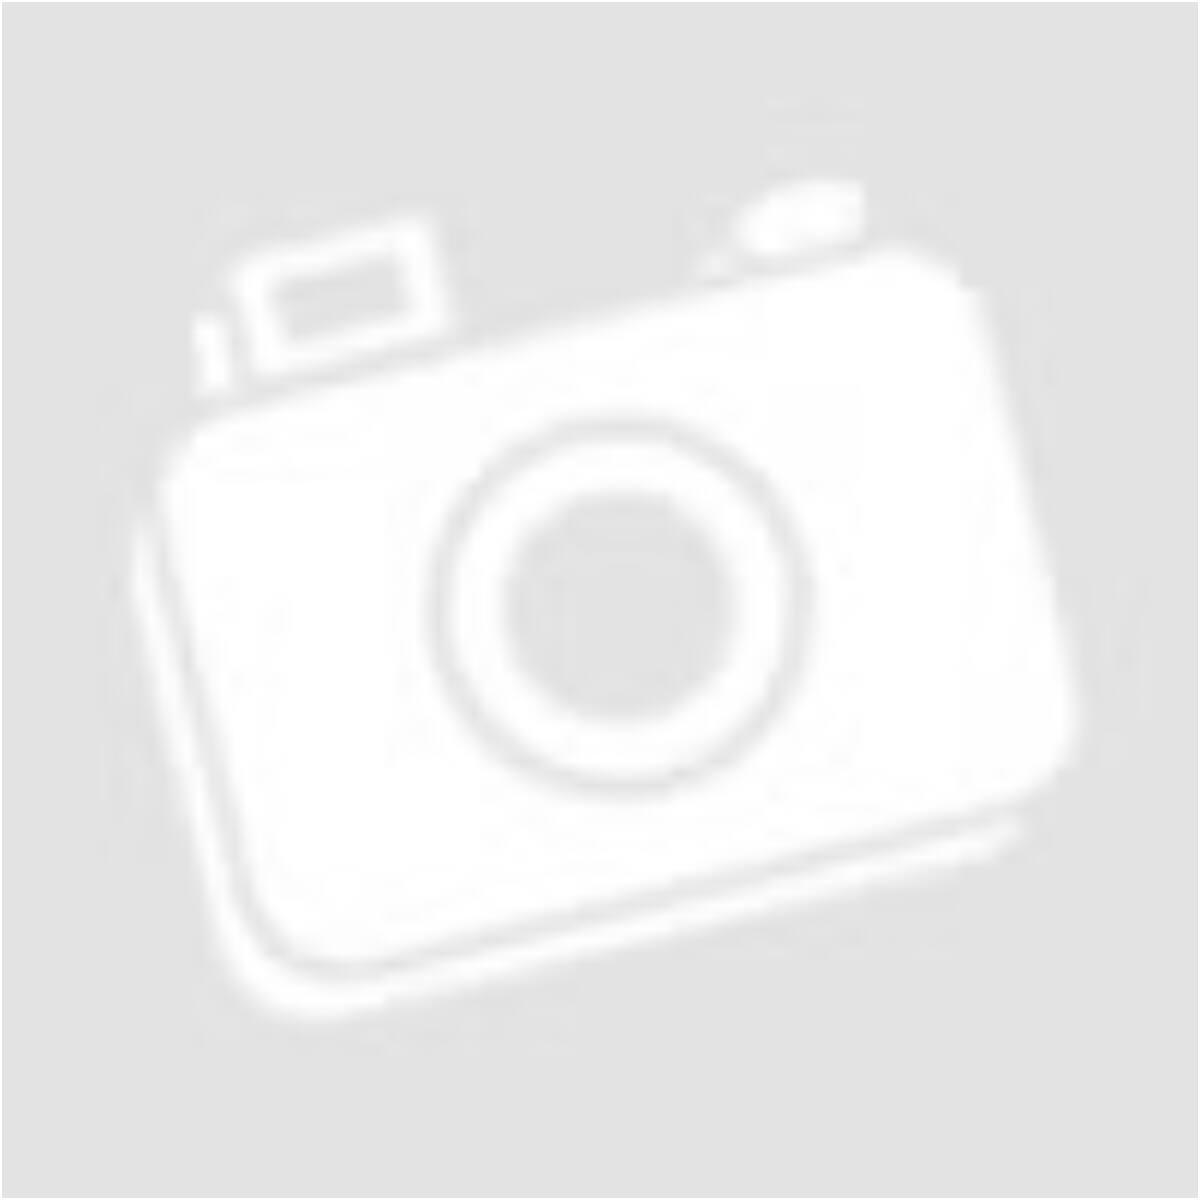 f2da2cd526 JSTYLE férfi télikabát #3088 - fekete - Télikabátok